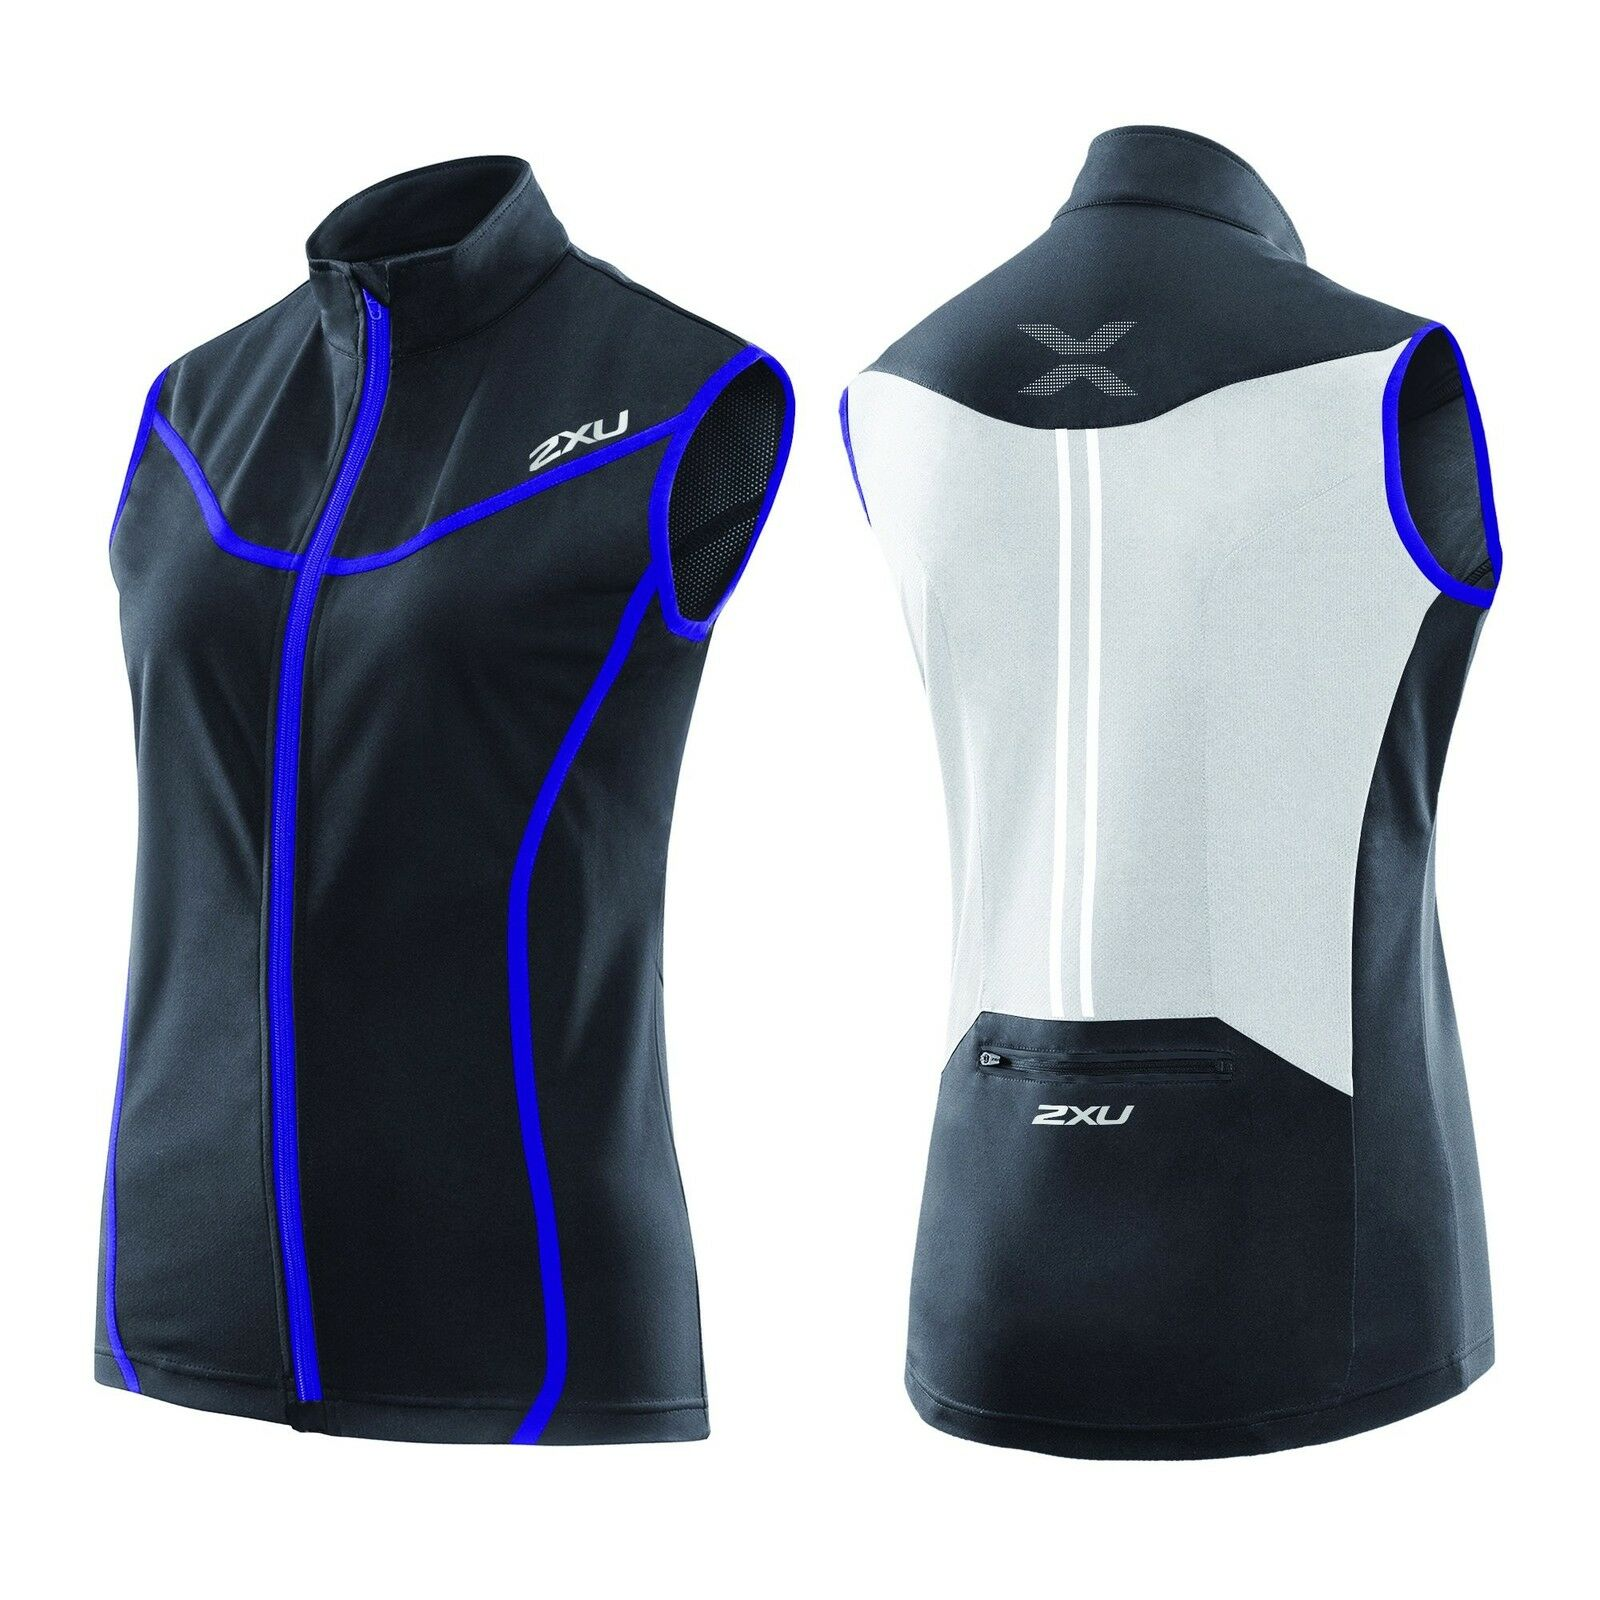 NWT 2XU Women's Elite X Cycle Vest, Small